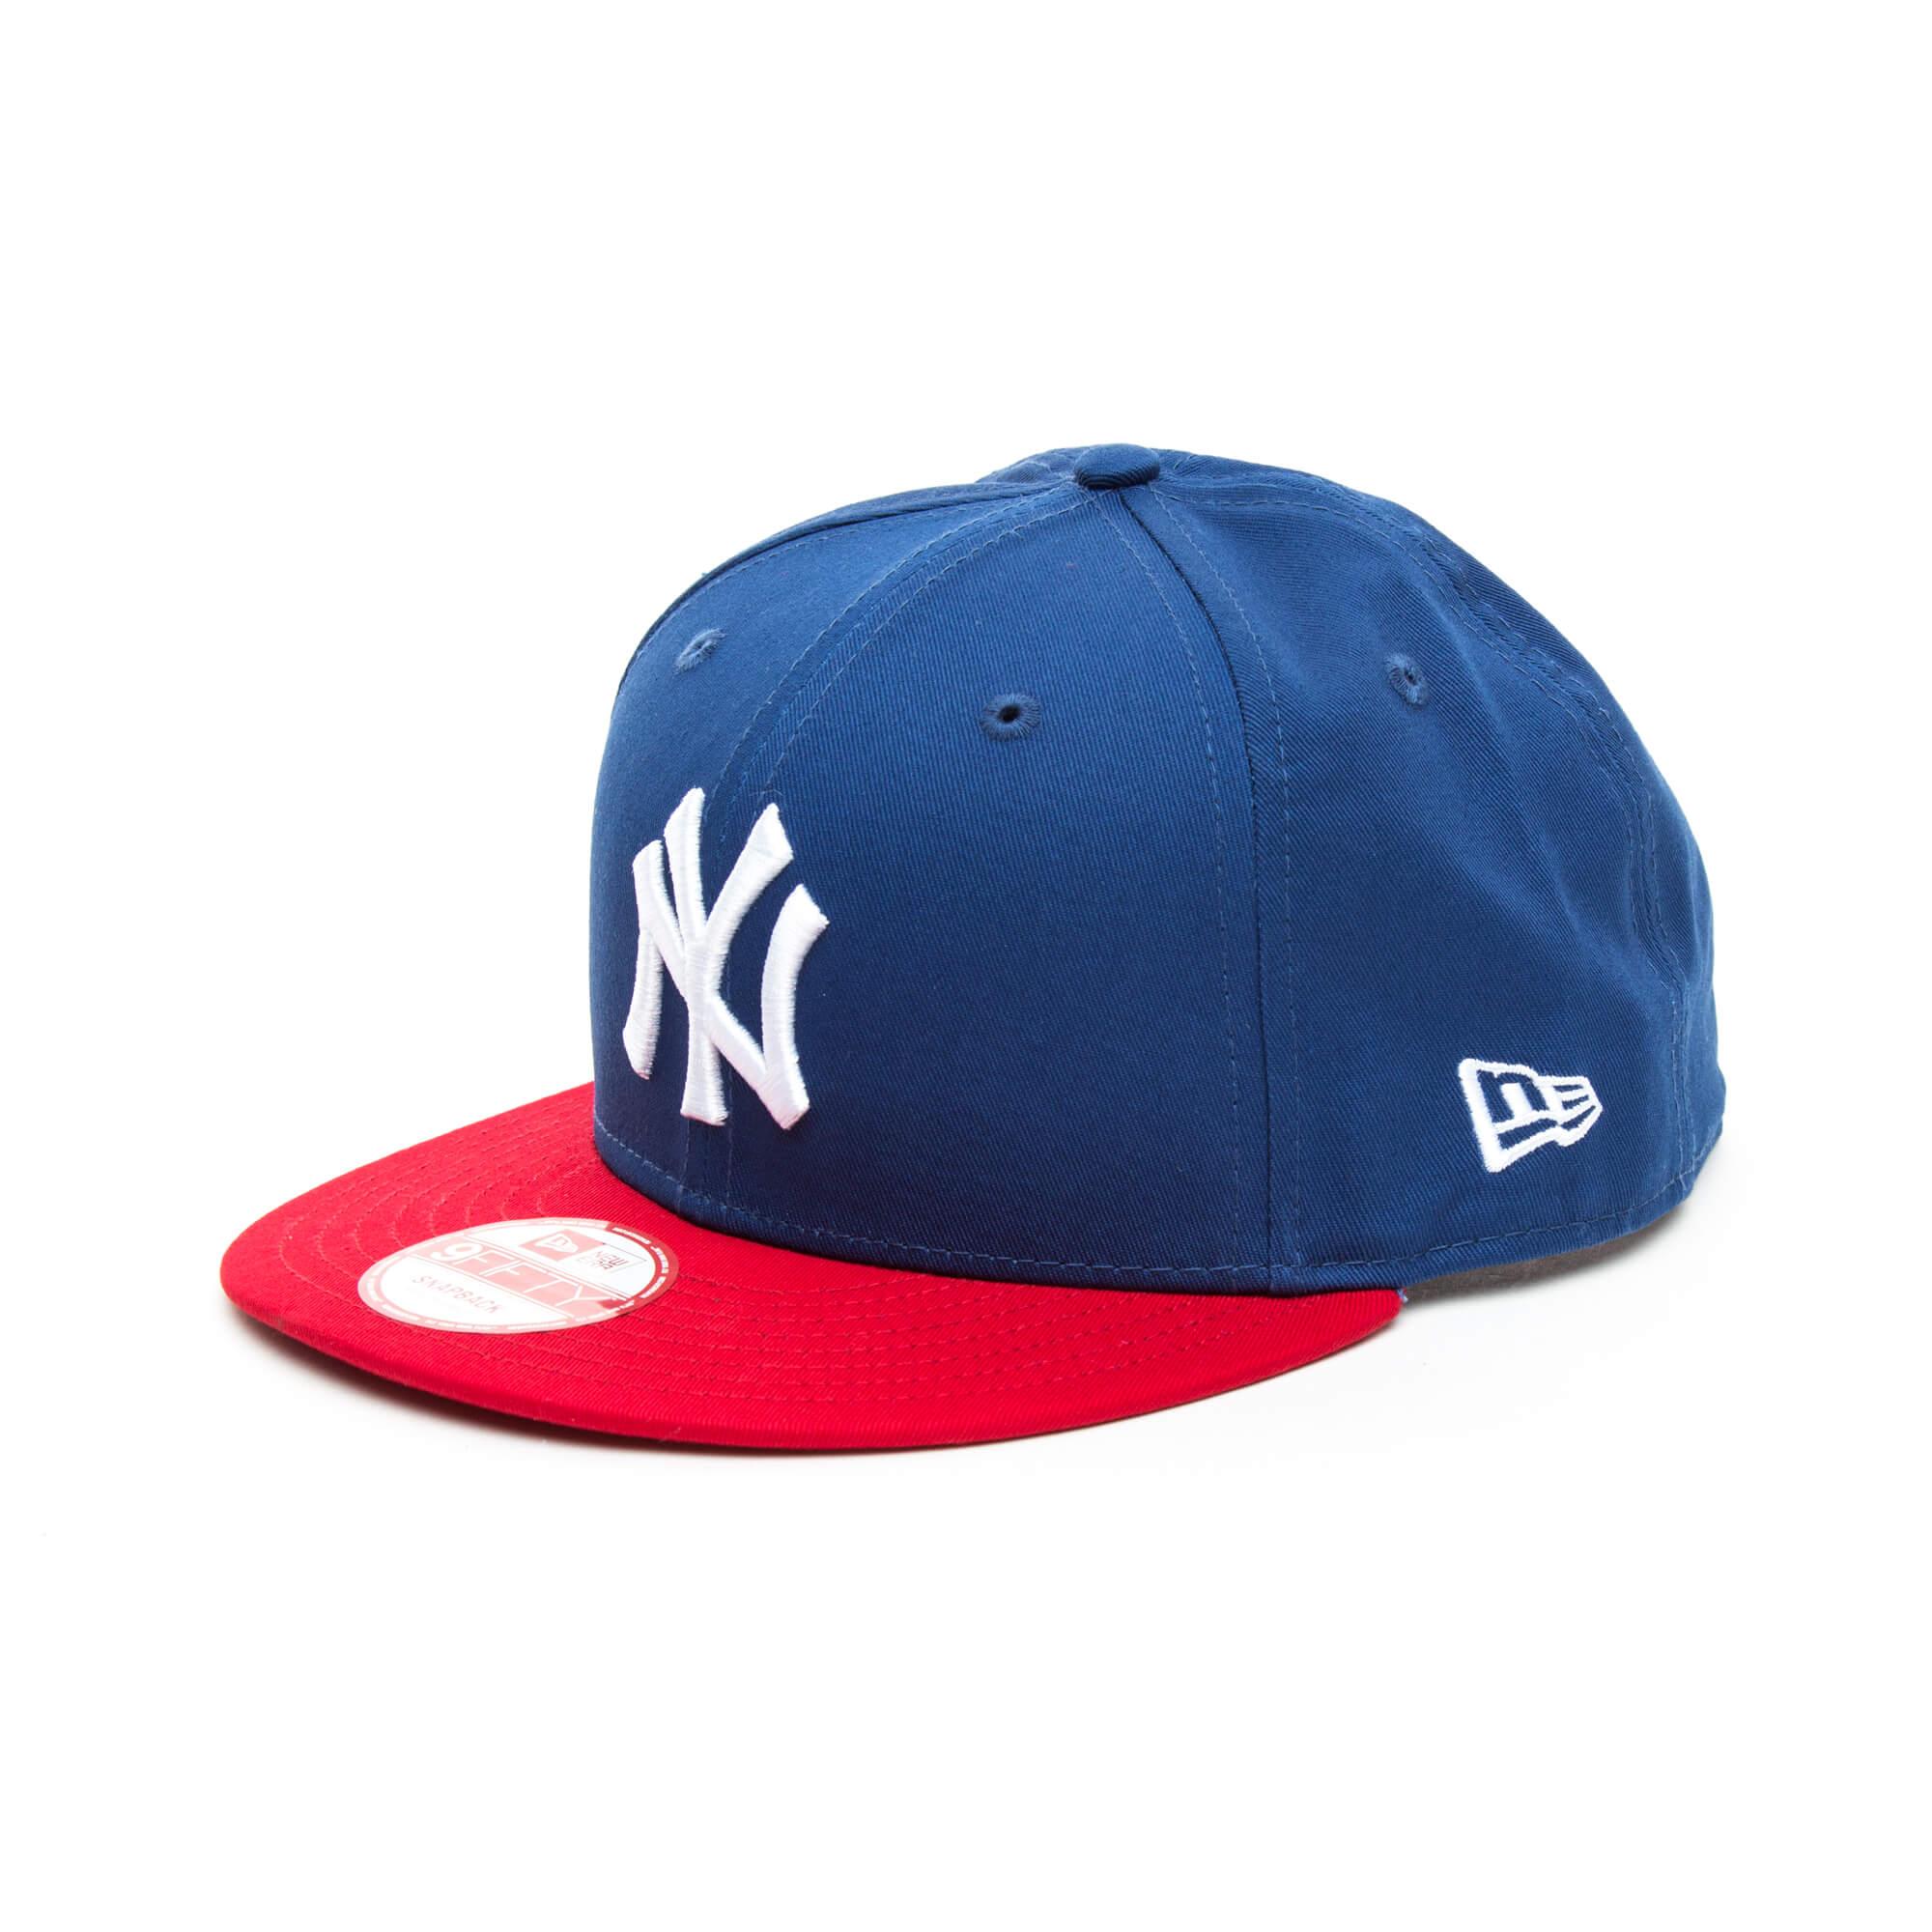 New Era New York Yankees Unisex Mavi Şapka